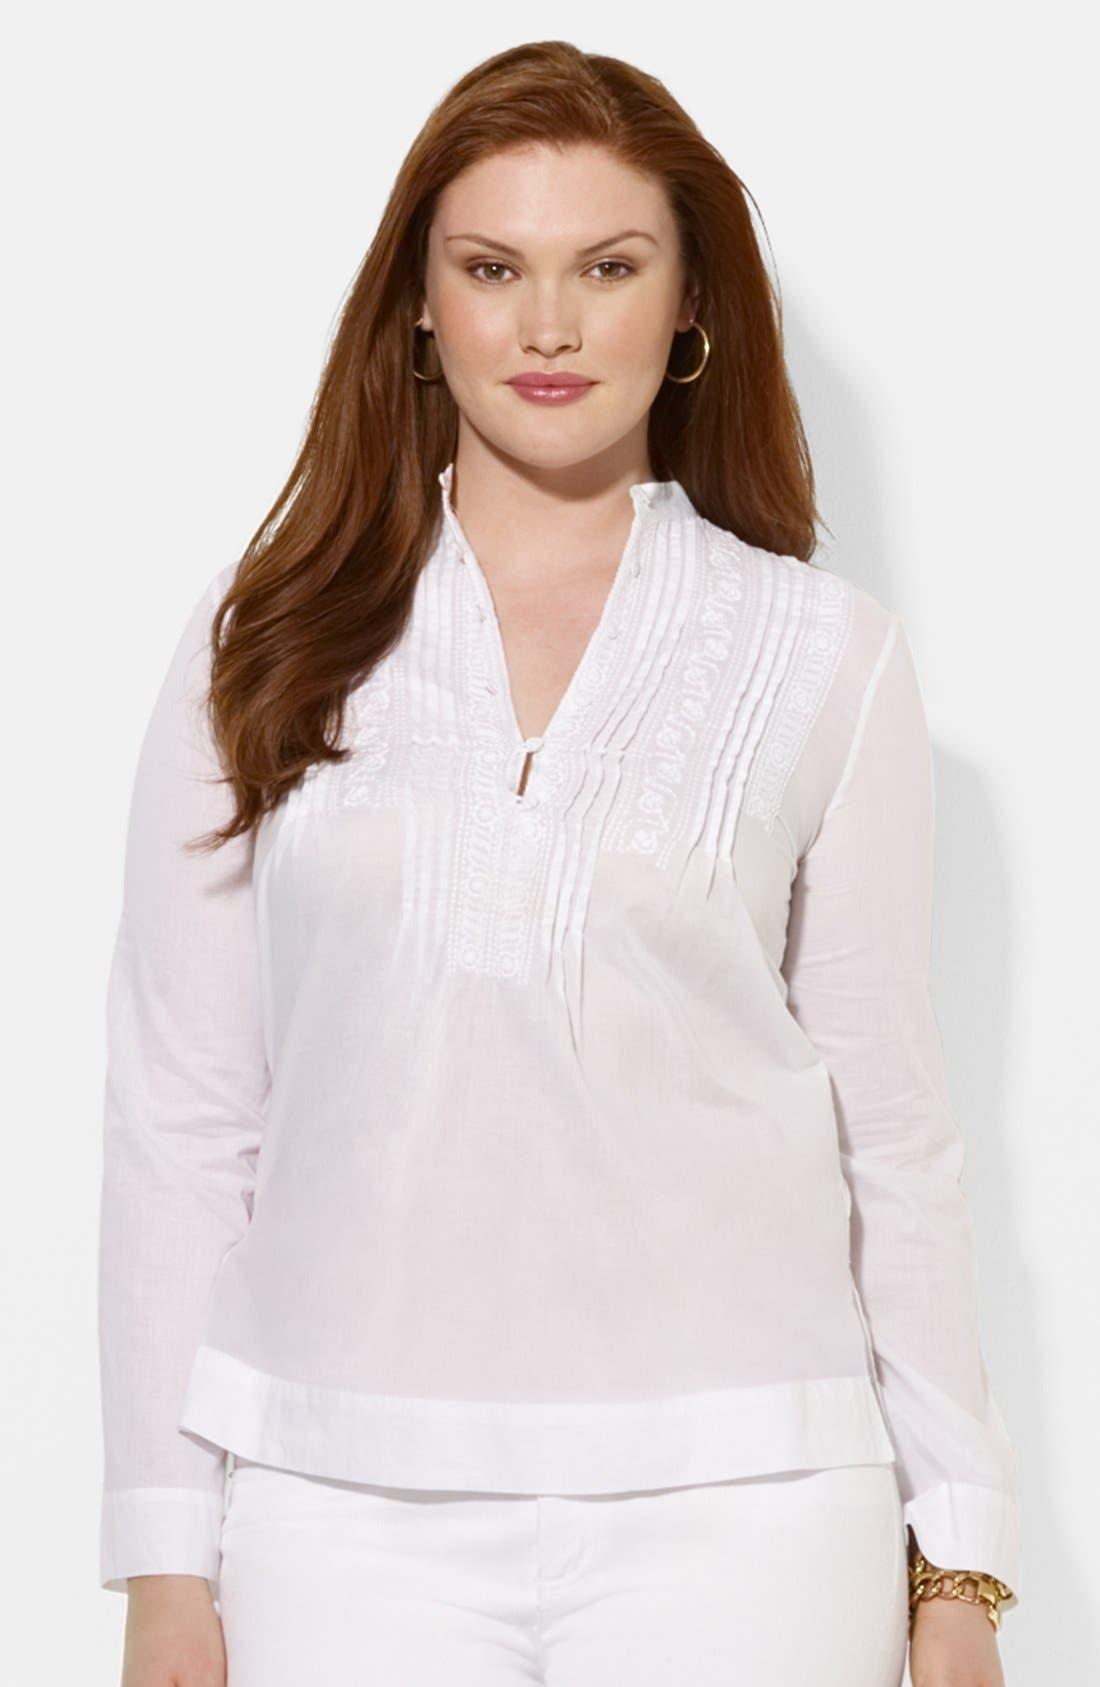 Alternate Image 1 Selected - Lauren Ralph Lauren Embroidered Blouse (Plus Size)